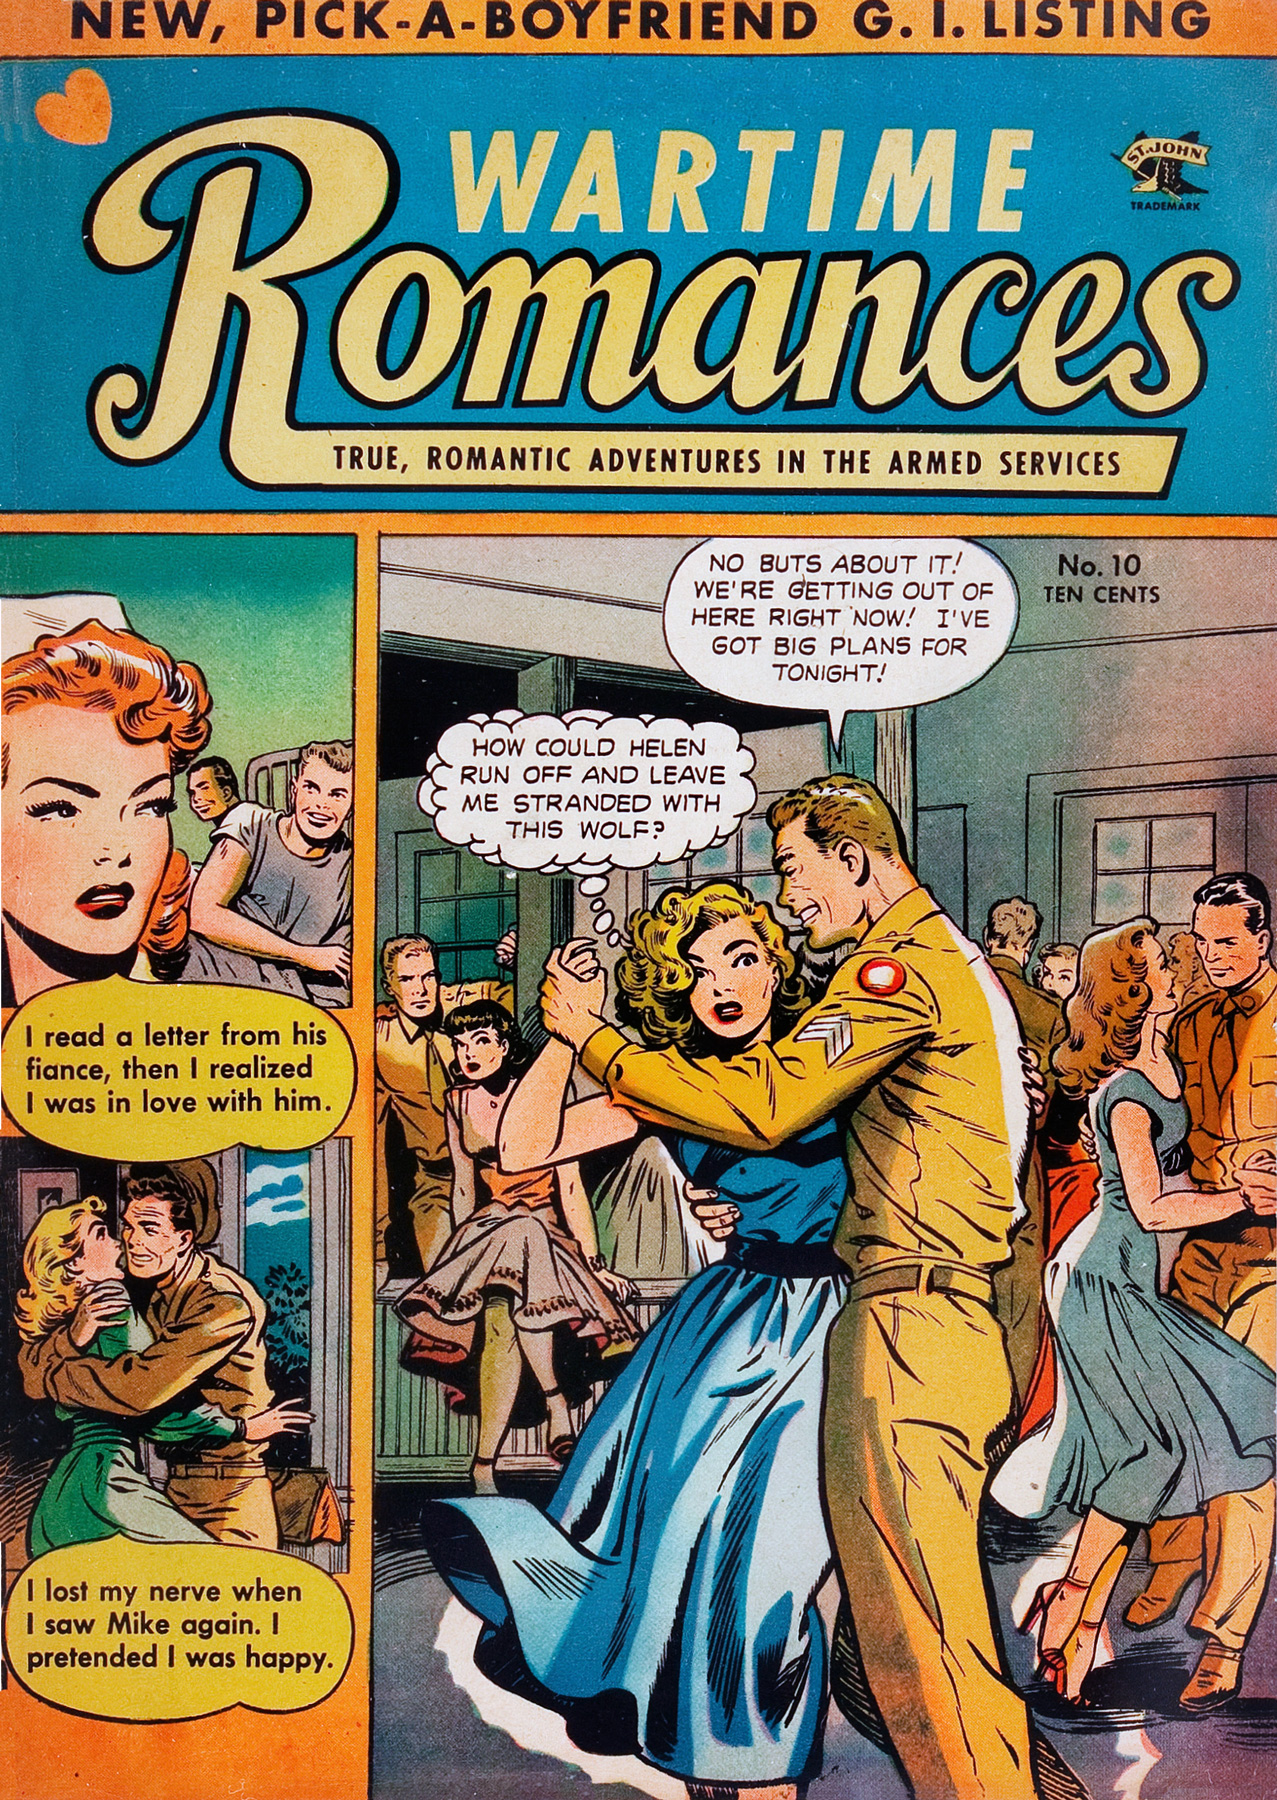 WartimeRomances10